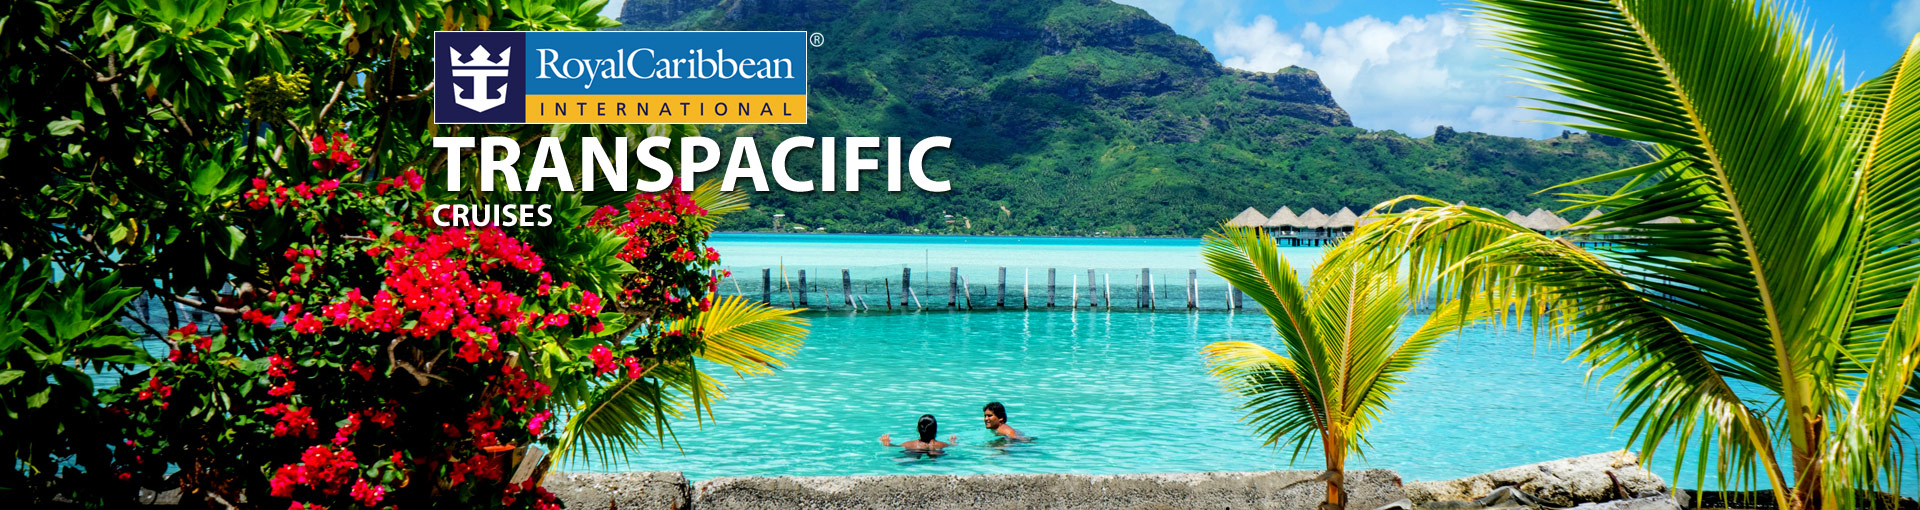 Royal Caribbean Transpacific Cruises